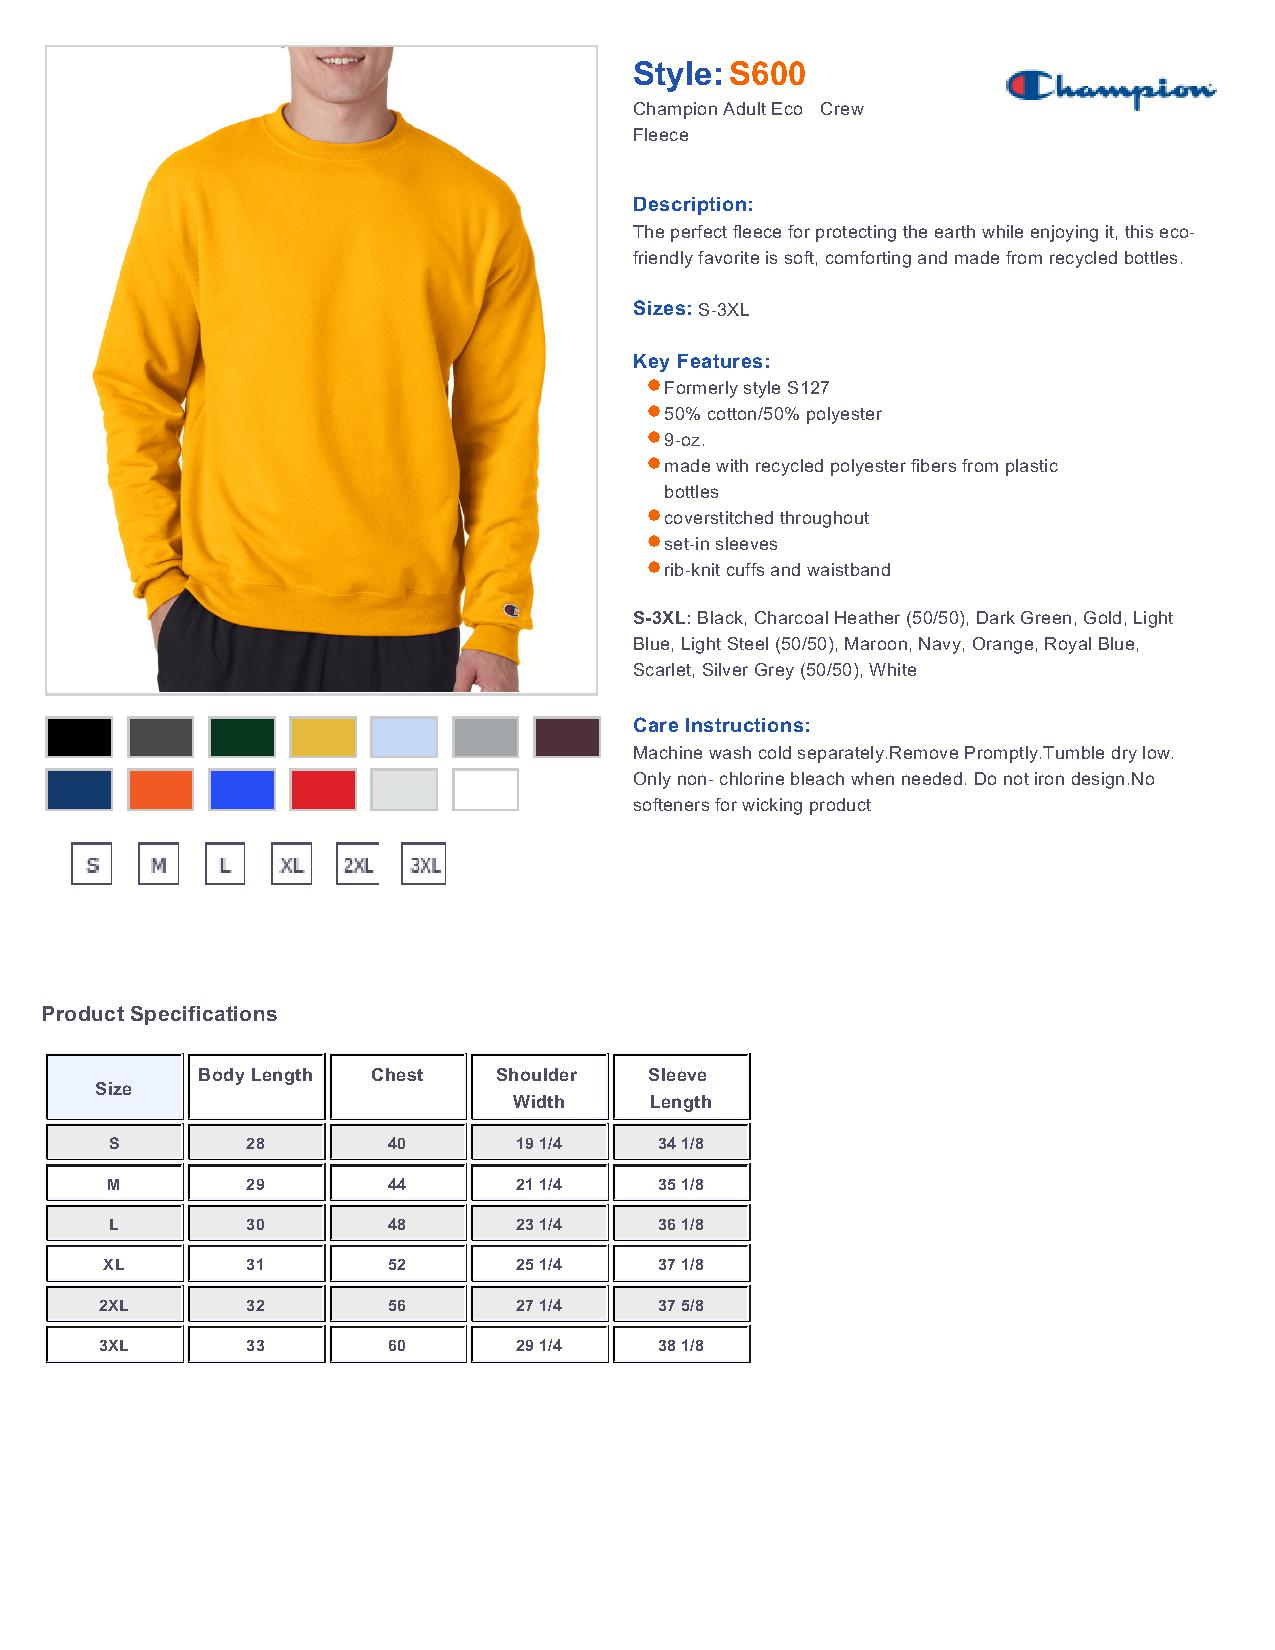 75ca3a683ed4 Champion S600 - Double Dry Eco Crewneck Sweatshirt  11.68 - Women s ...